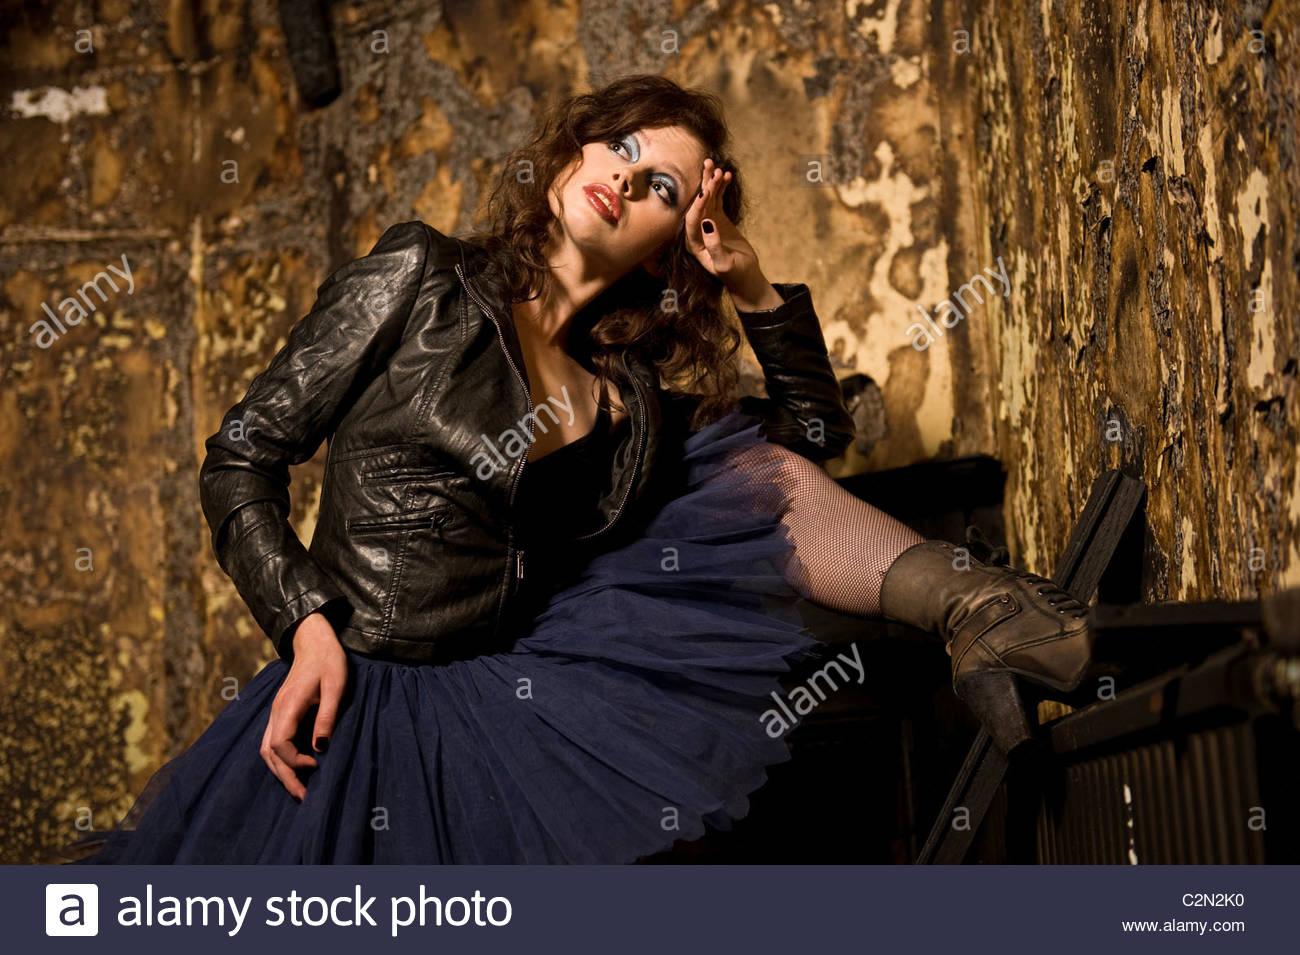 Kaukasische Fotomodell in verbrannten Gebäude Stockbild